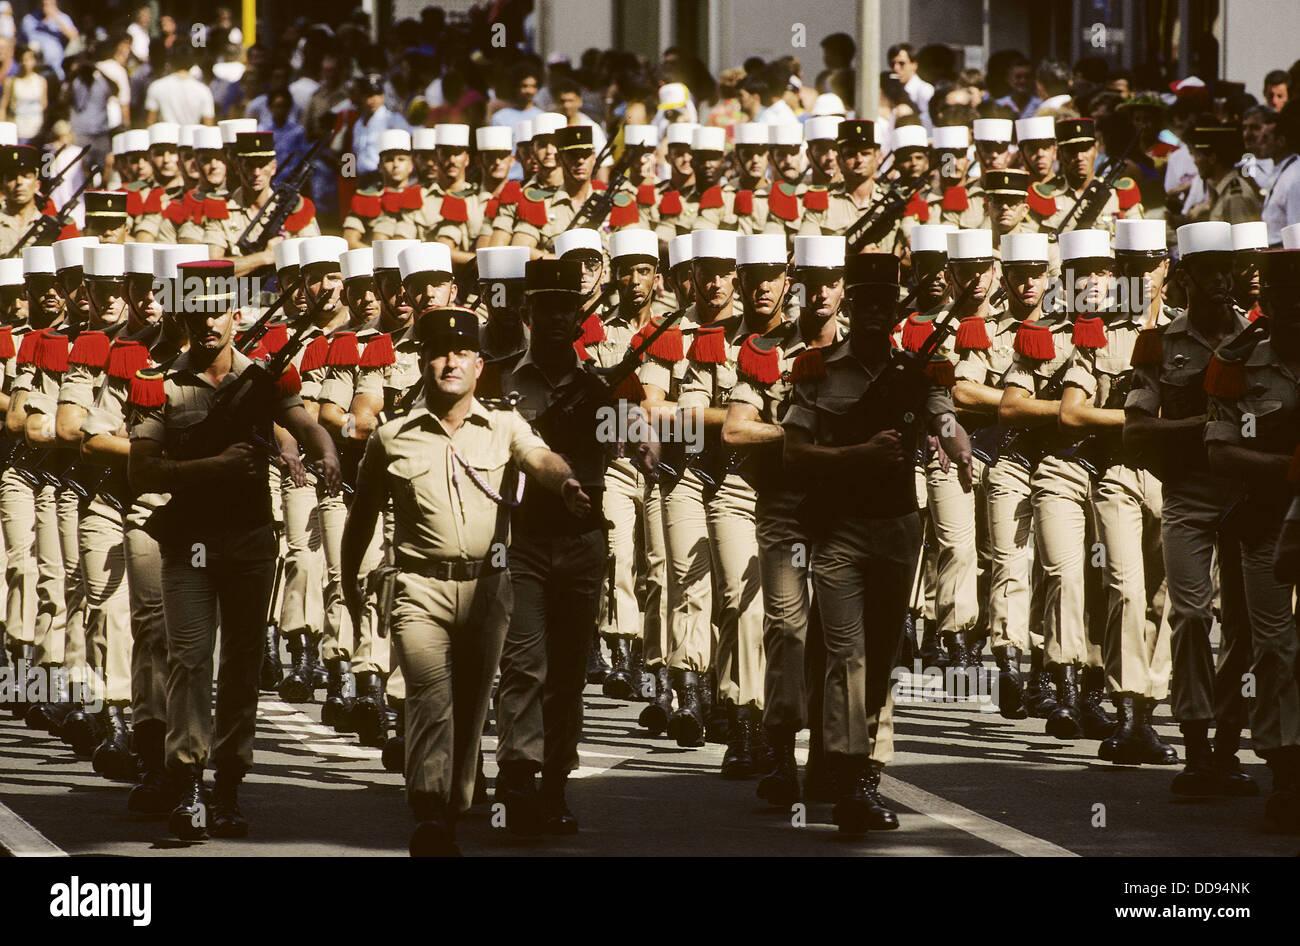 Legion Etrangere. The Fourteenth of July military parade. Heiva Tahiti. City of Papeete (capital). Tahiti Island. - Stock Image